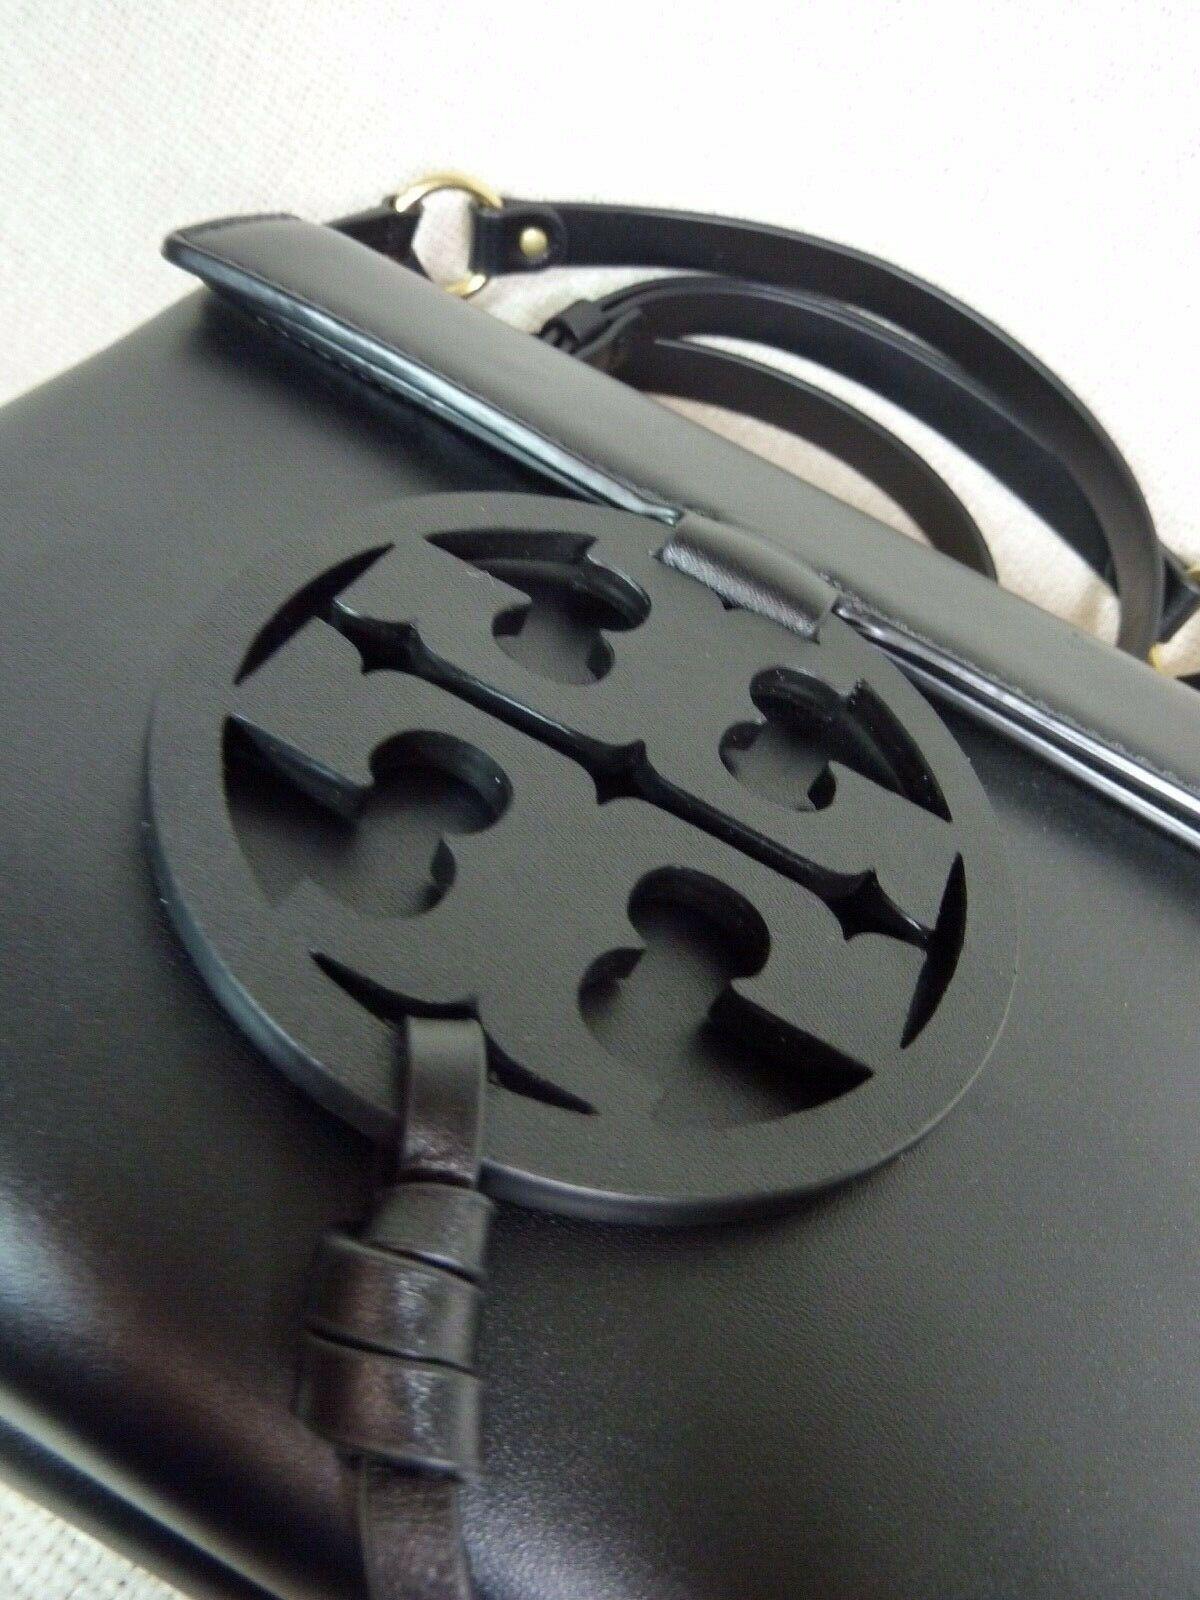 NWT Tory Burch Black Leather Miller Cross-Body Bag $398